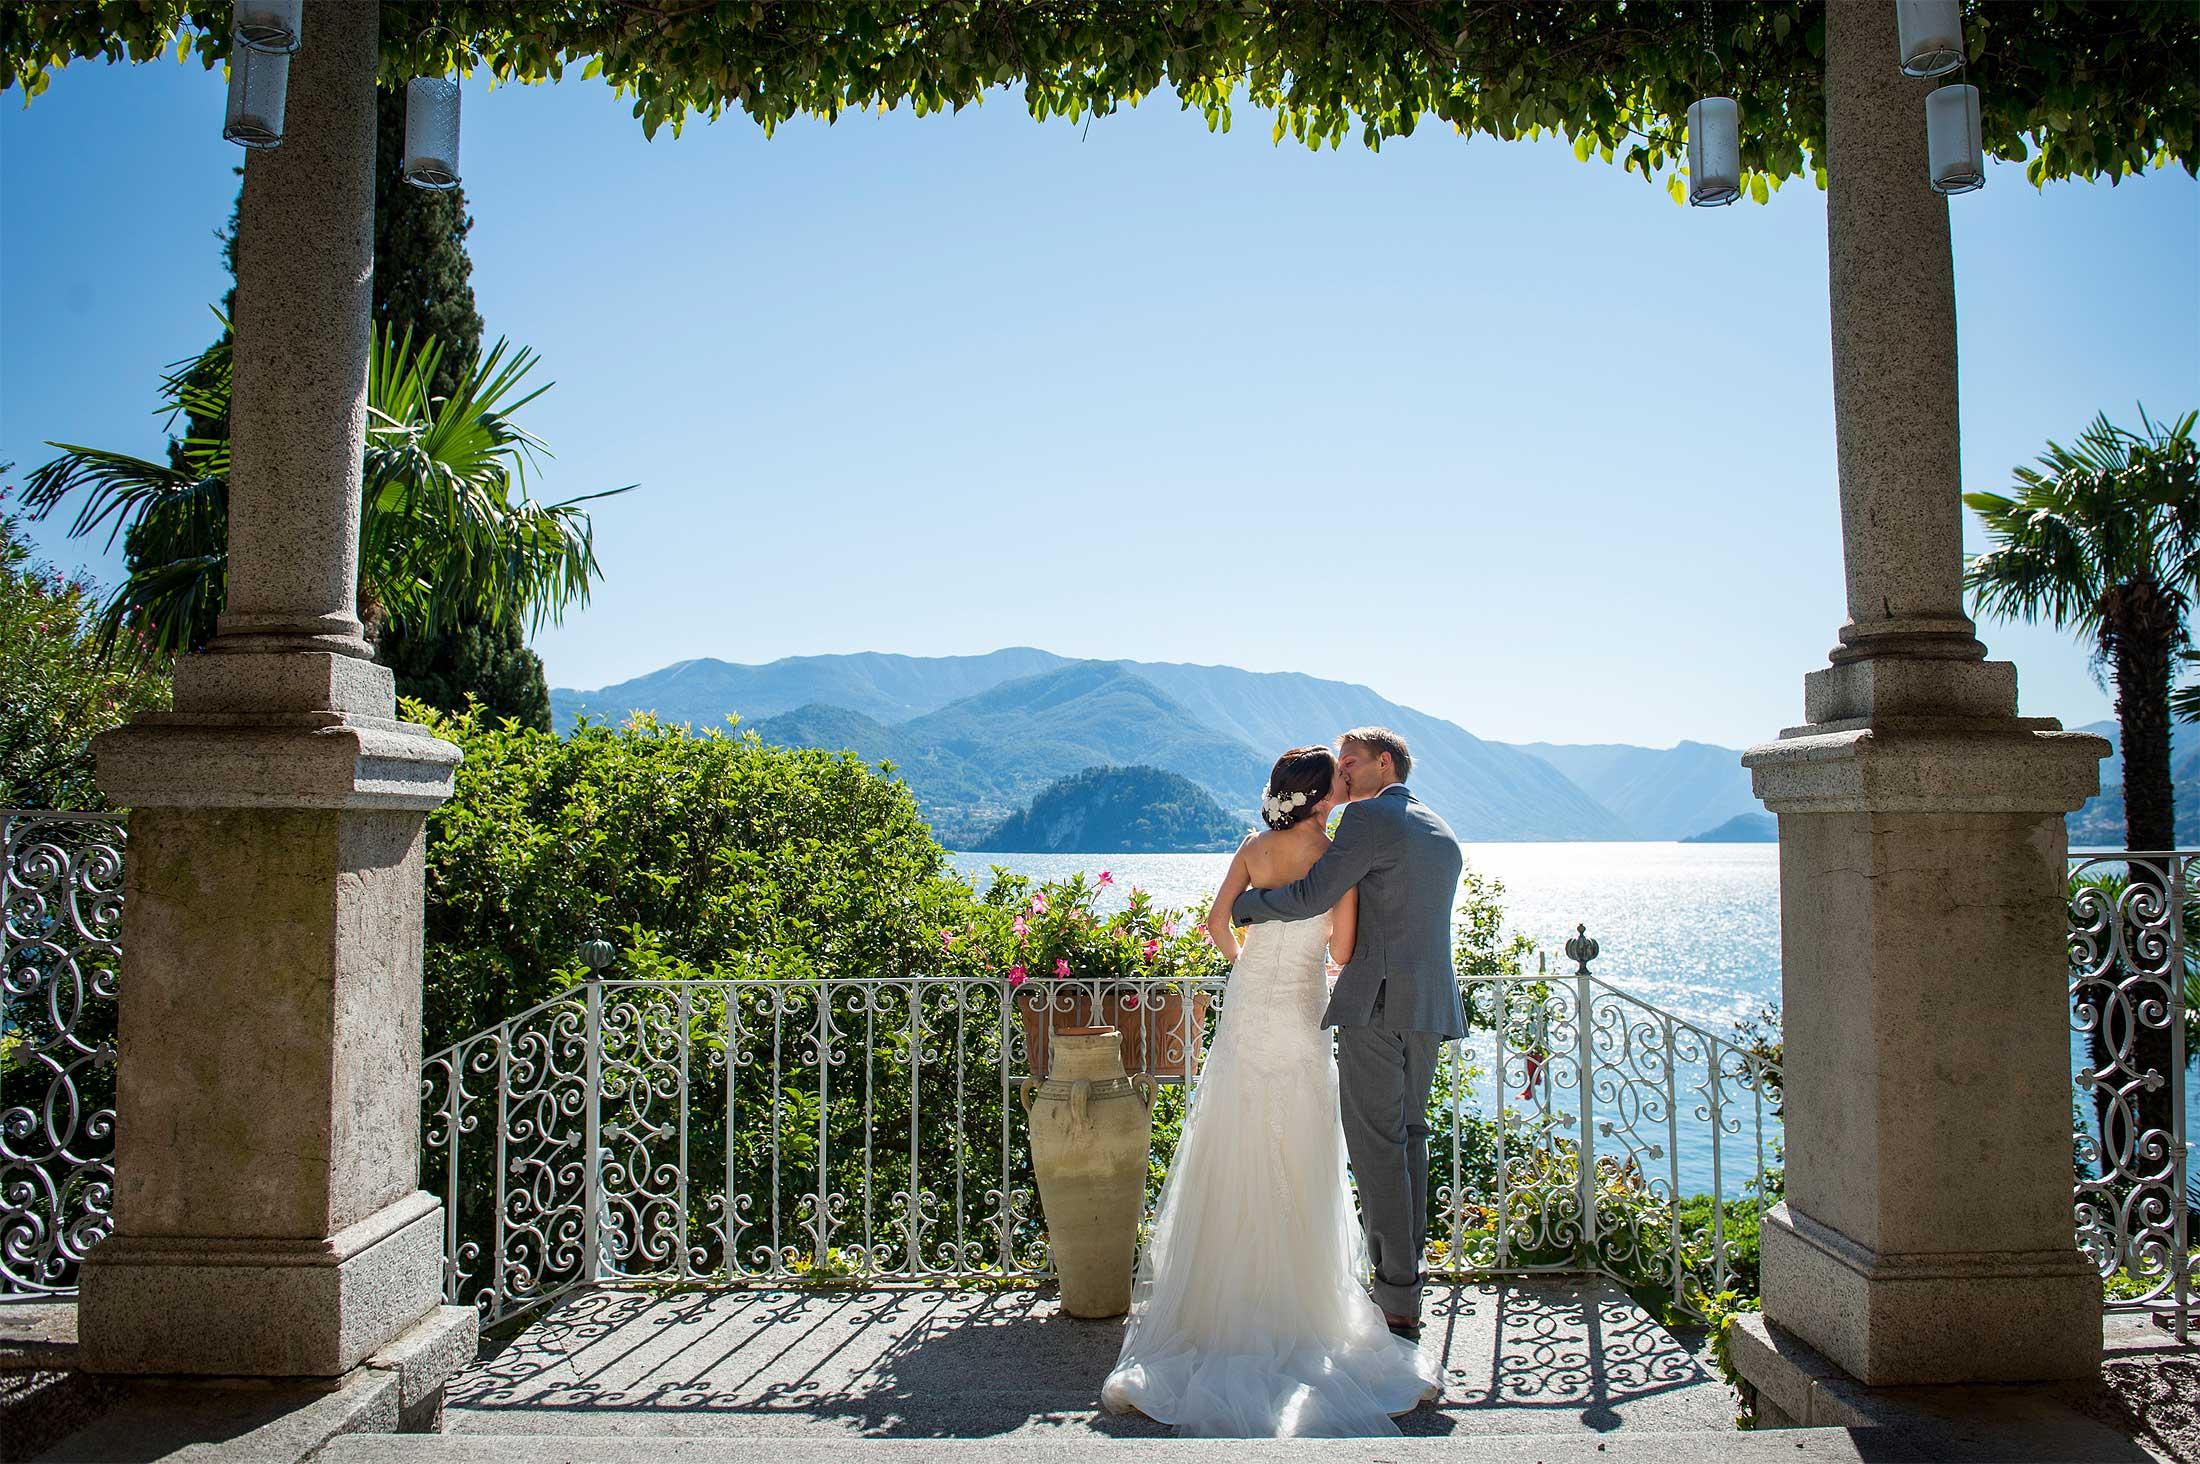 Wedding venue lake Como, Varenna, Villa Cipressi, Lake Como, Italy